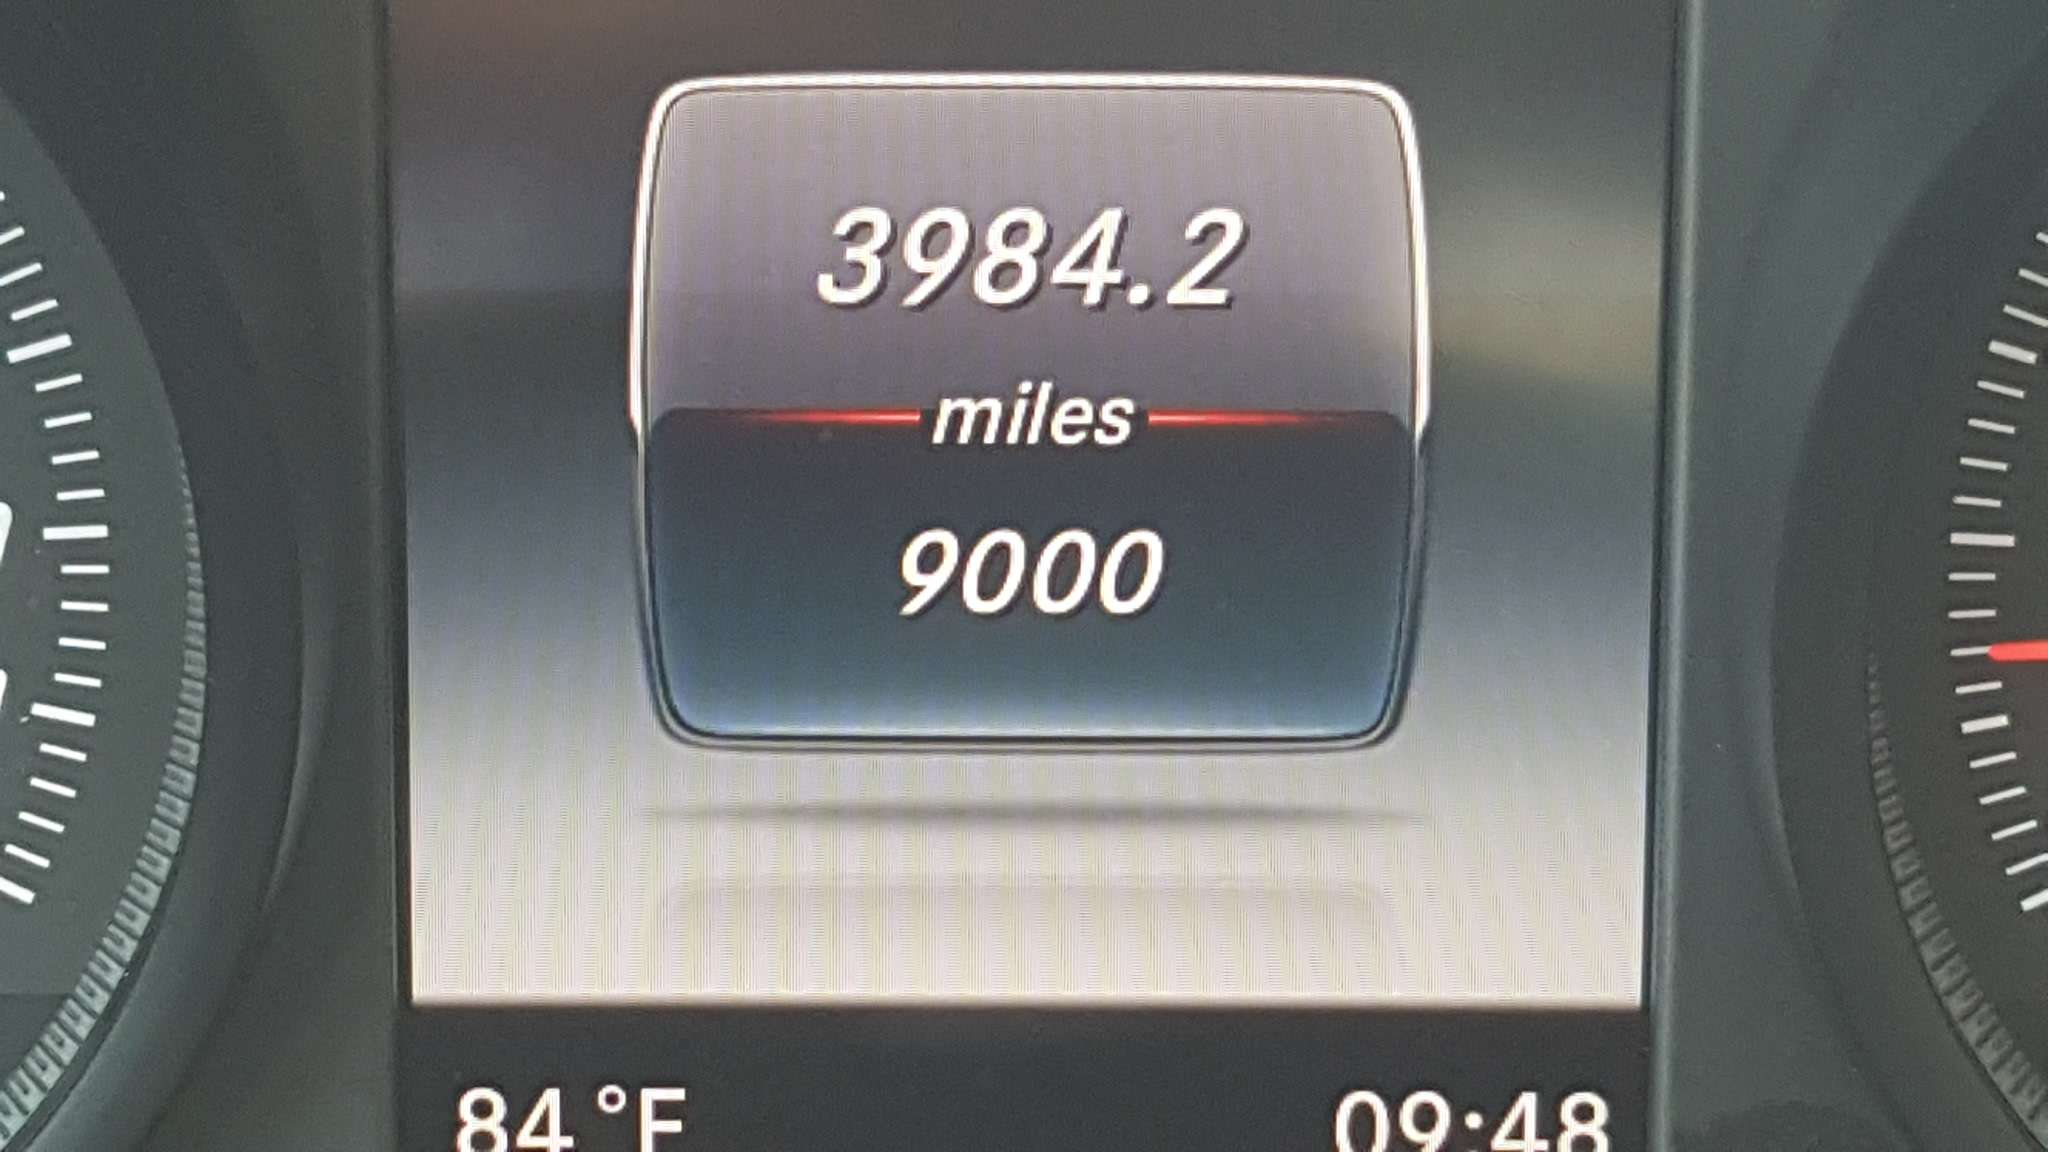 Pre-Owned 2019 Mercedes-Benz GLC 300 Rear Wheel Drive SUV